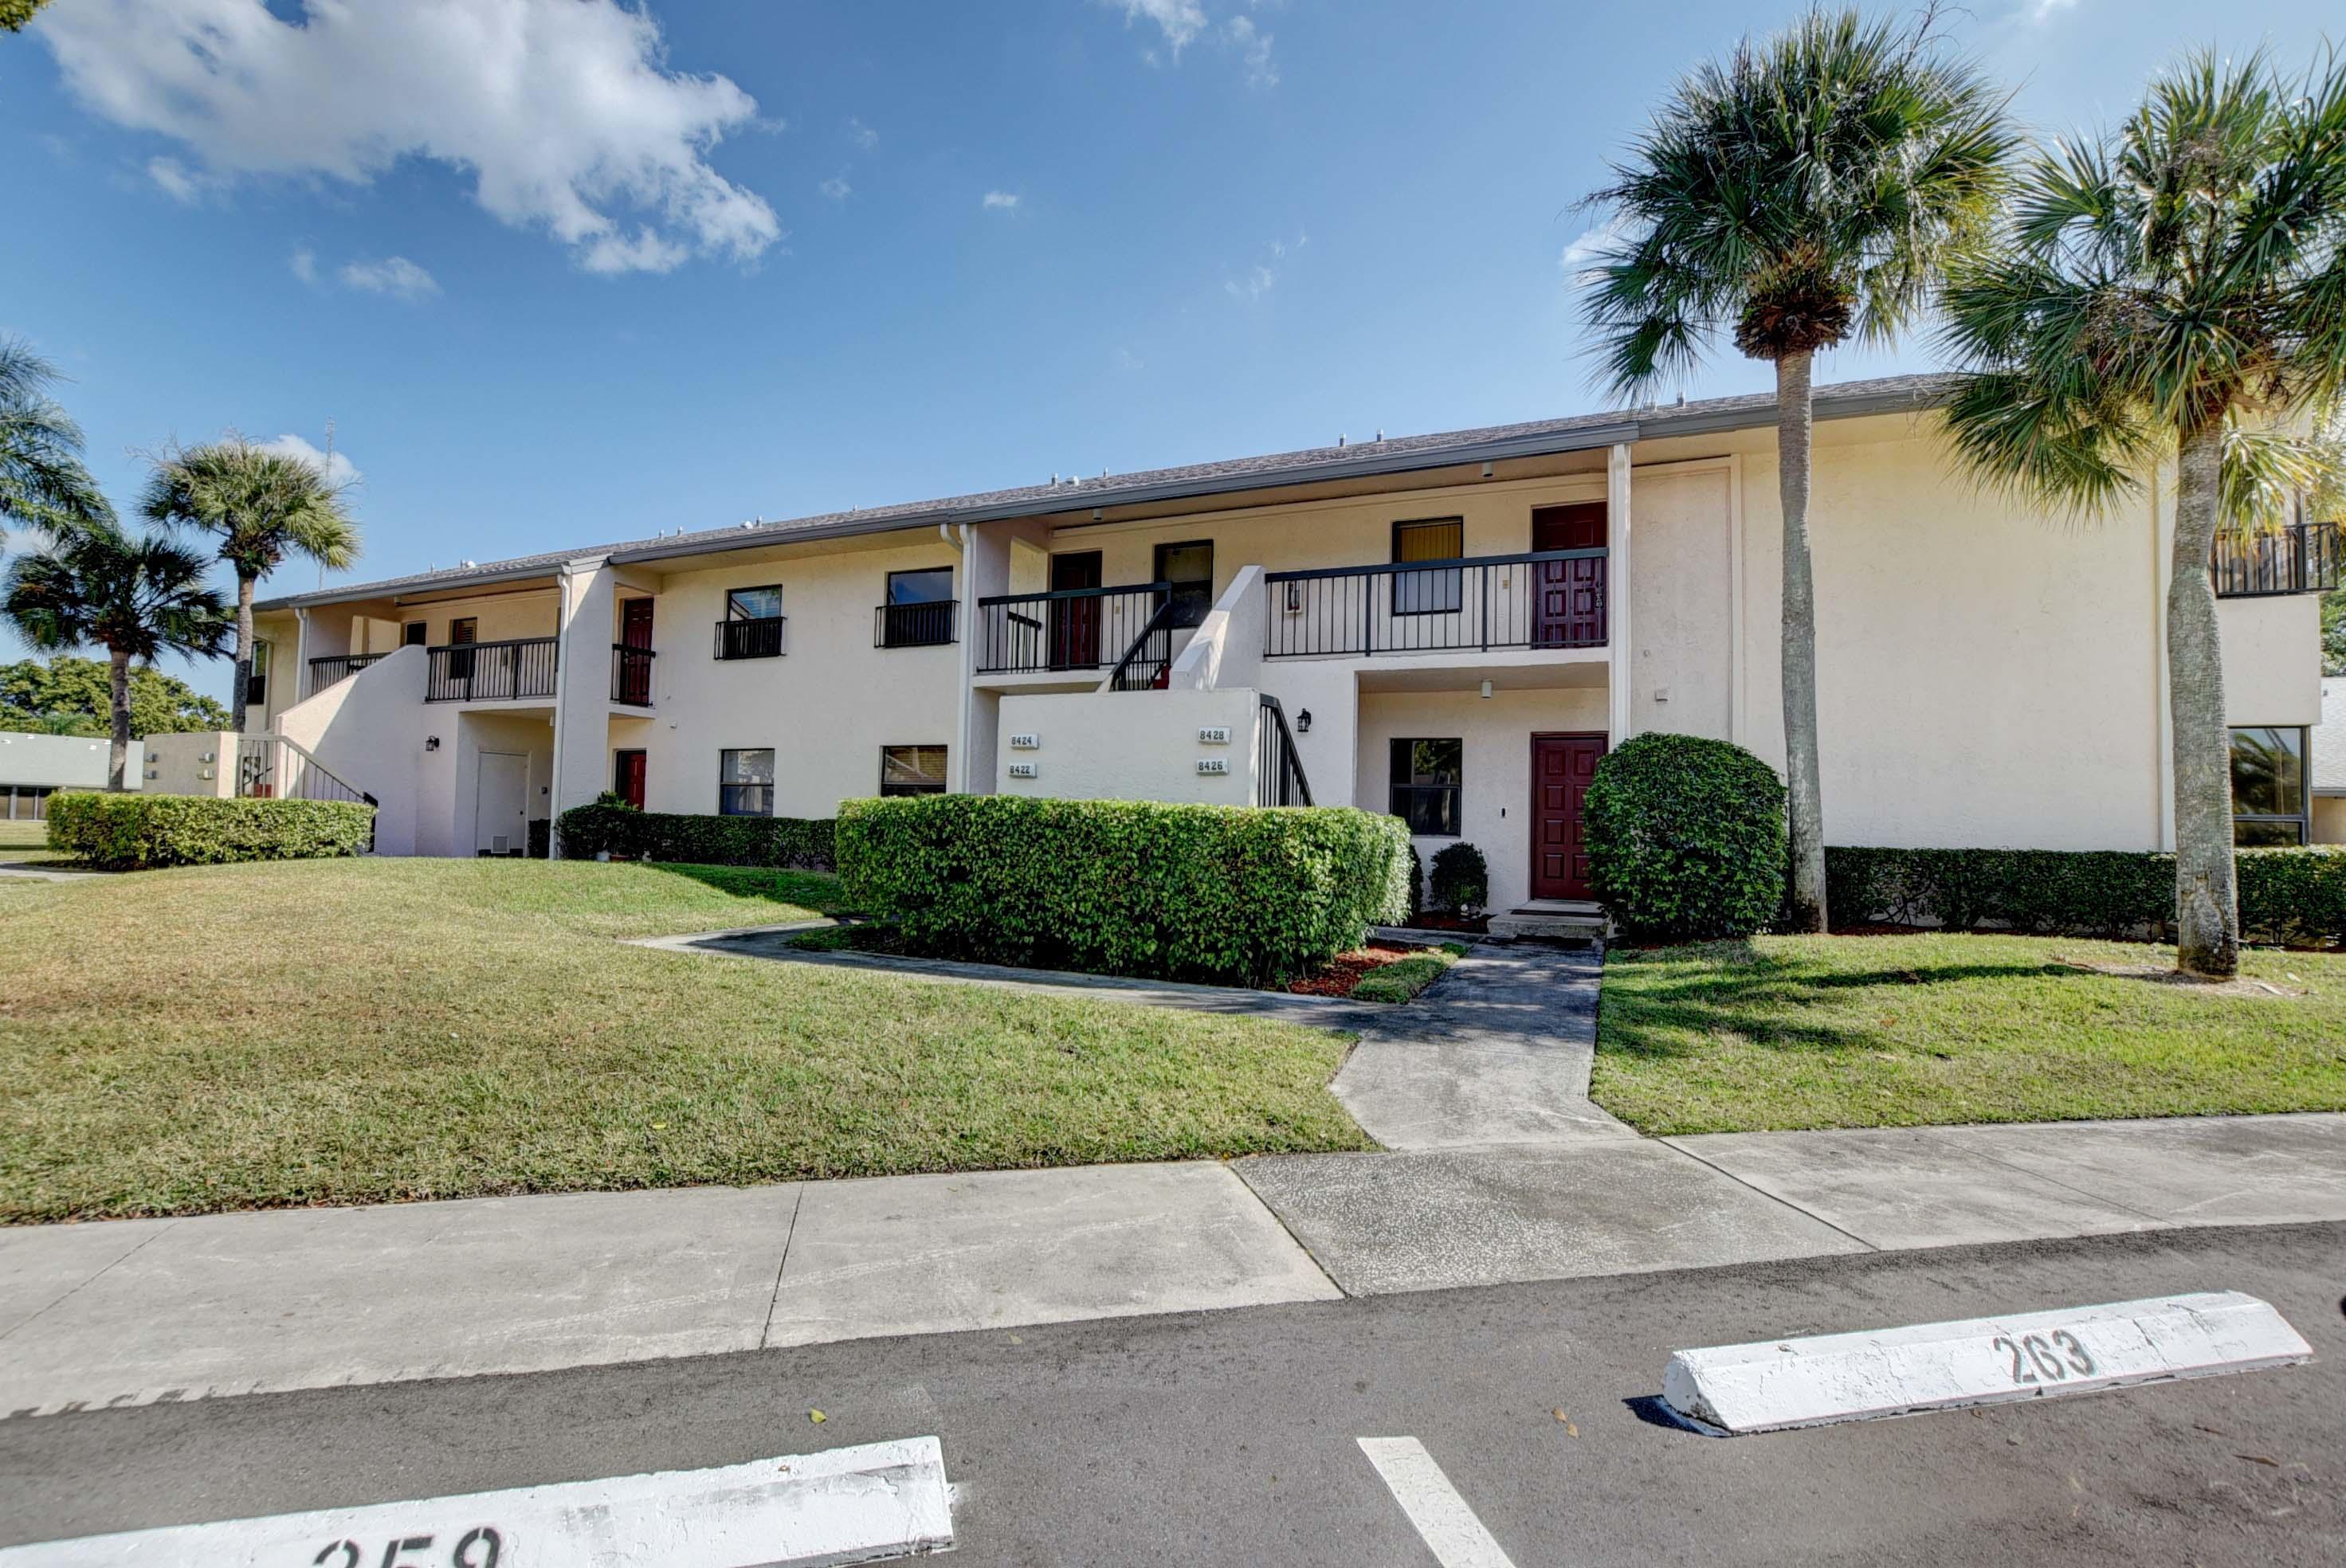 Home for sale in Boca Glades Boca Raton Florida